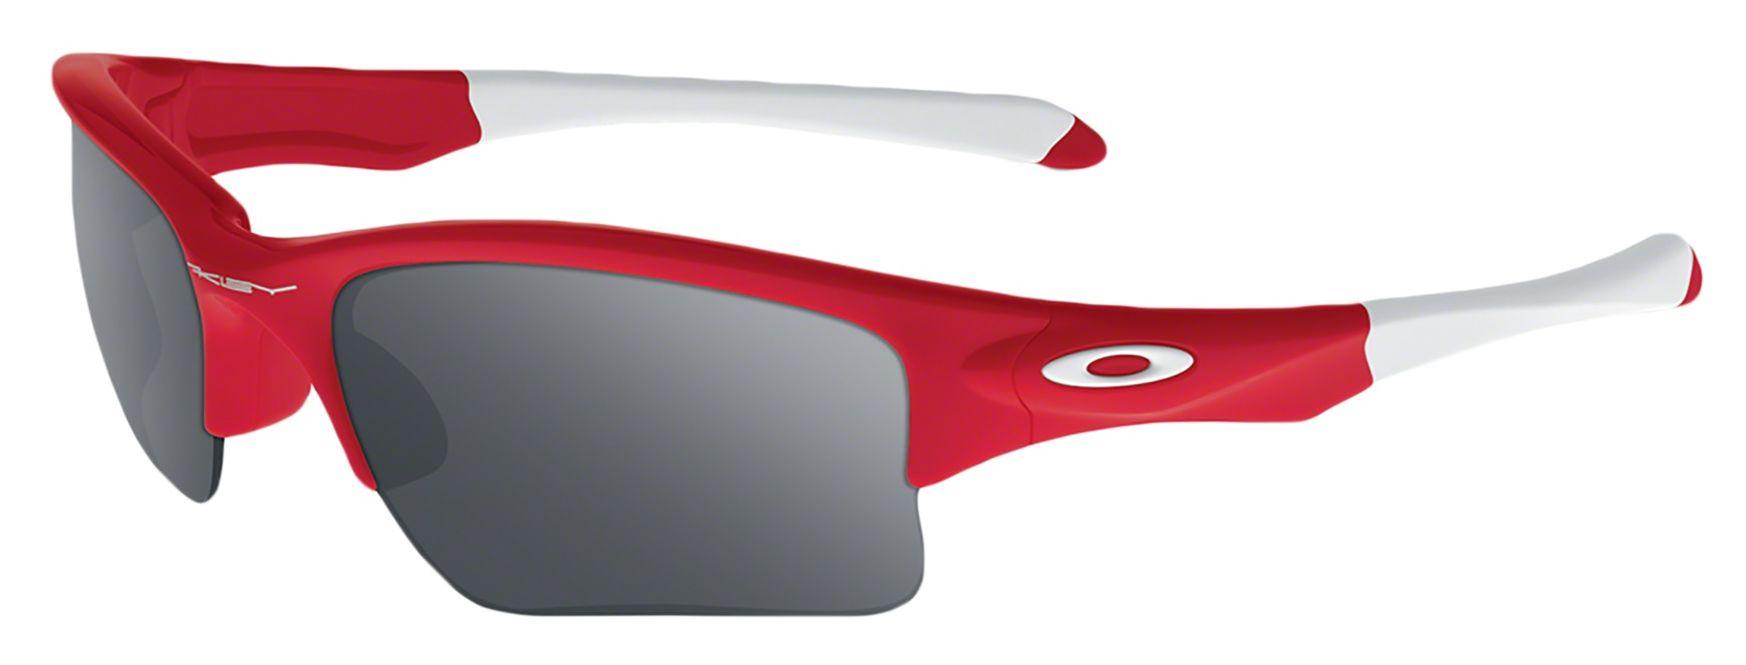 oakley sunglasses sale on facebook  oakley_youth_quarter_jacket_sunglasses